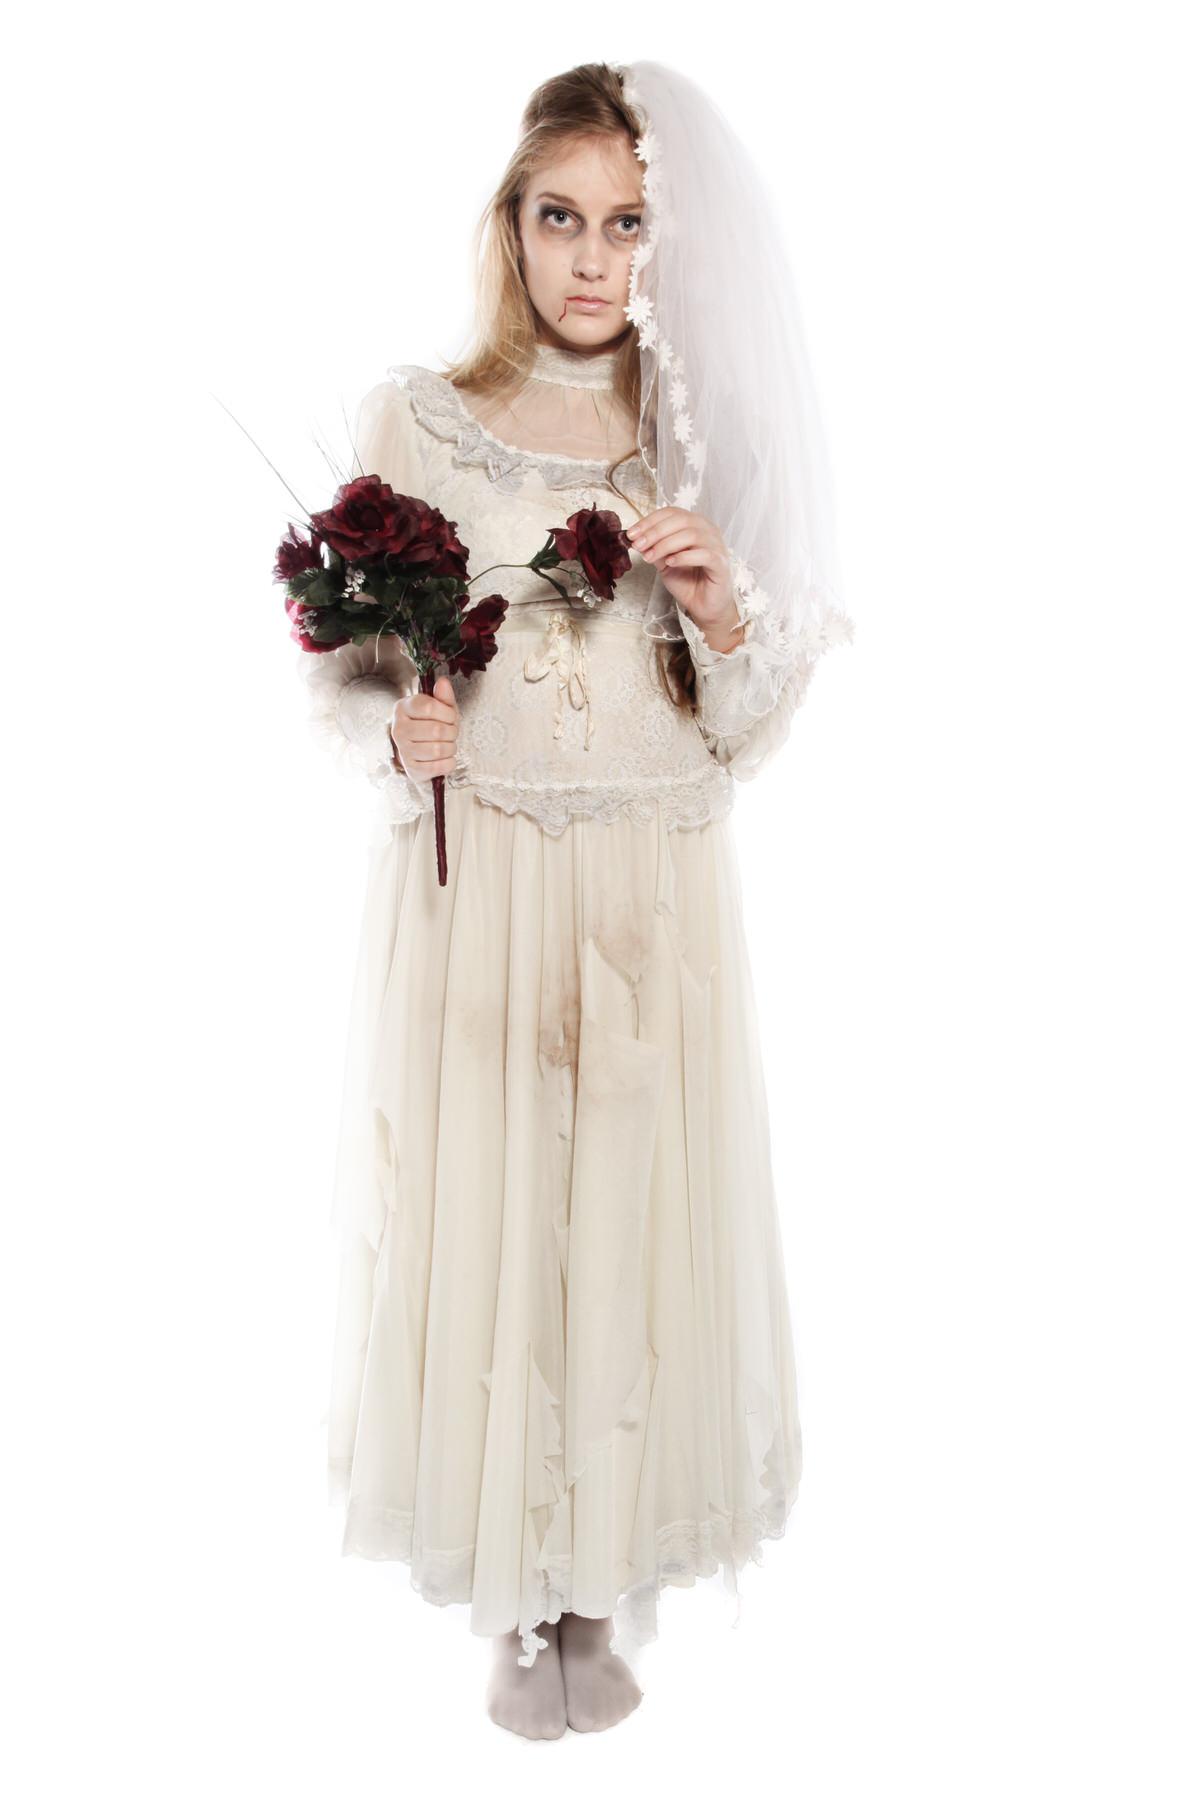 DEAD BRIDE WEDDING DRESS AND VEIL COSTUME